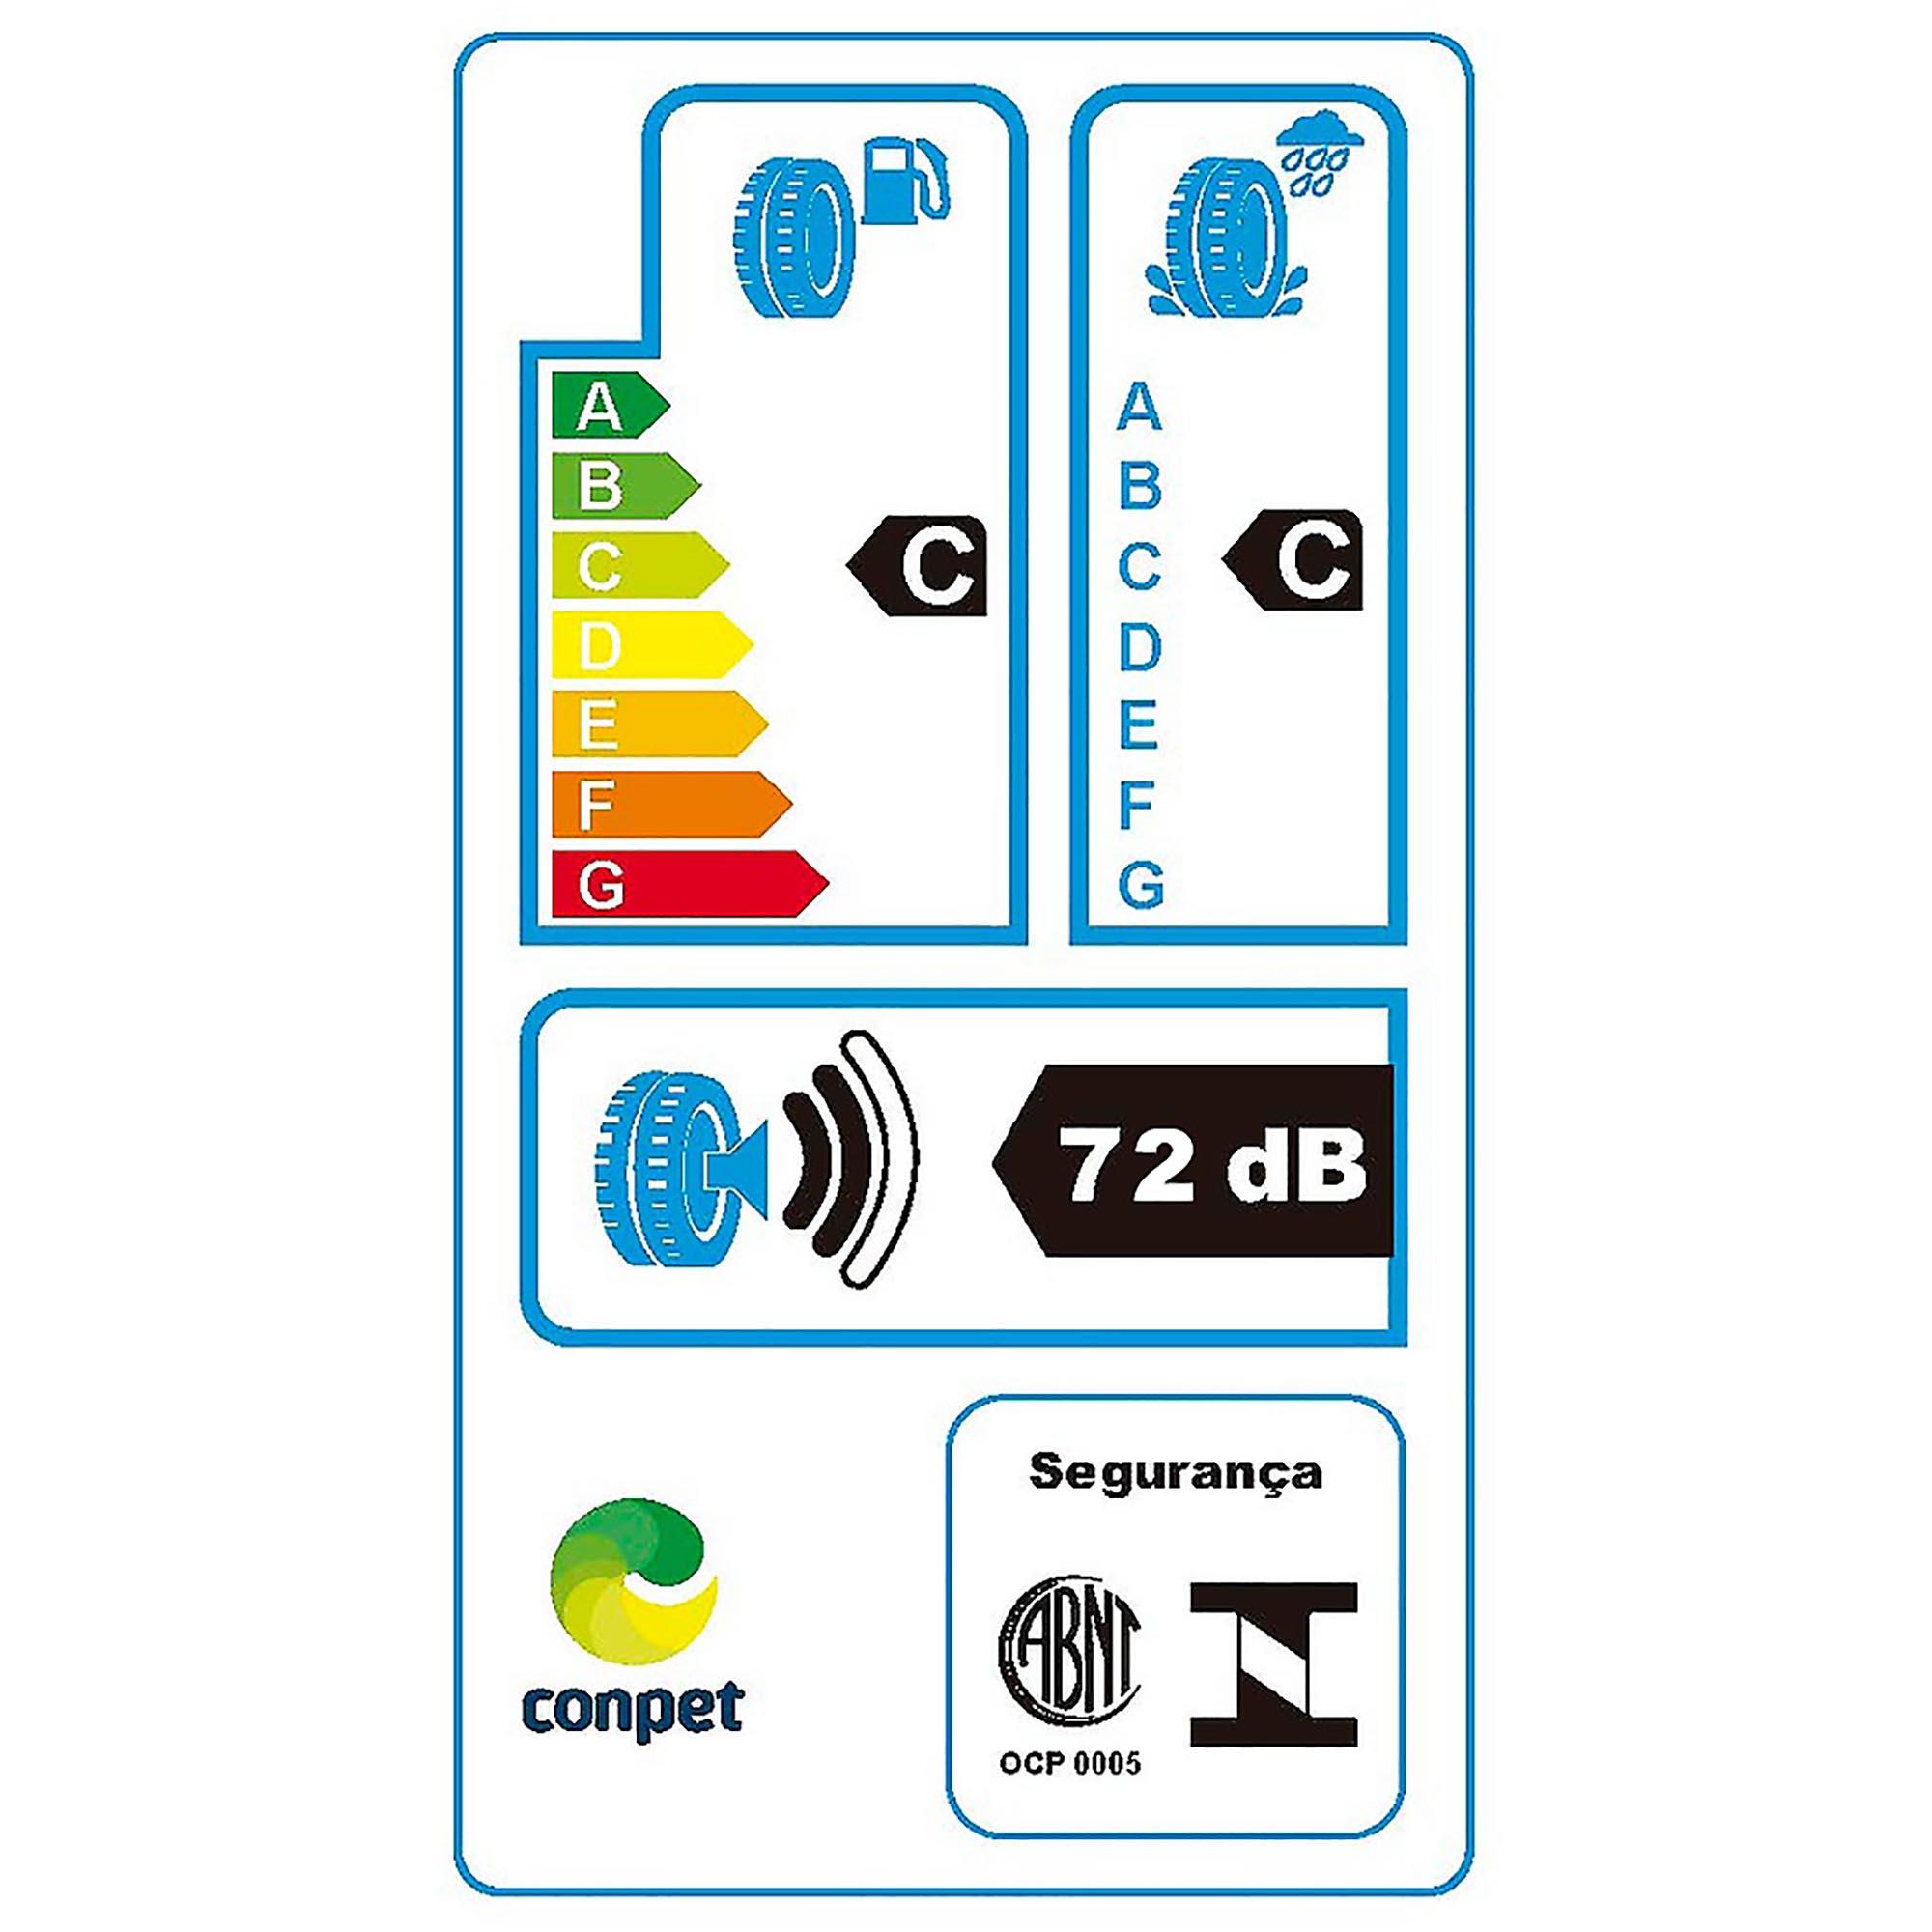 PNEU 205/55R16 91V FR POWERCONTACT 2 CONTINENTAL